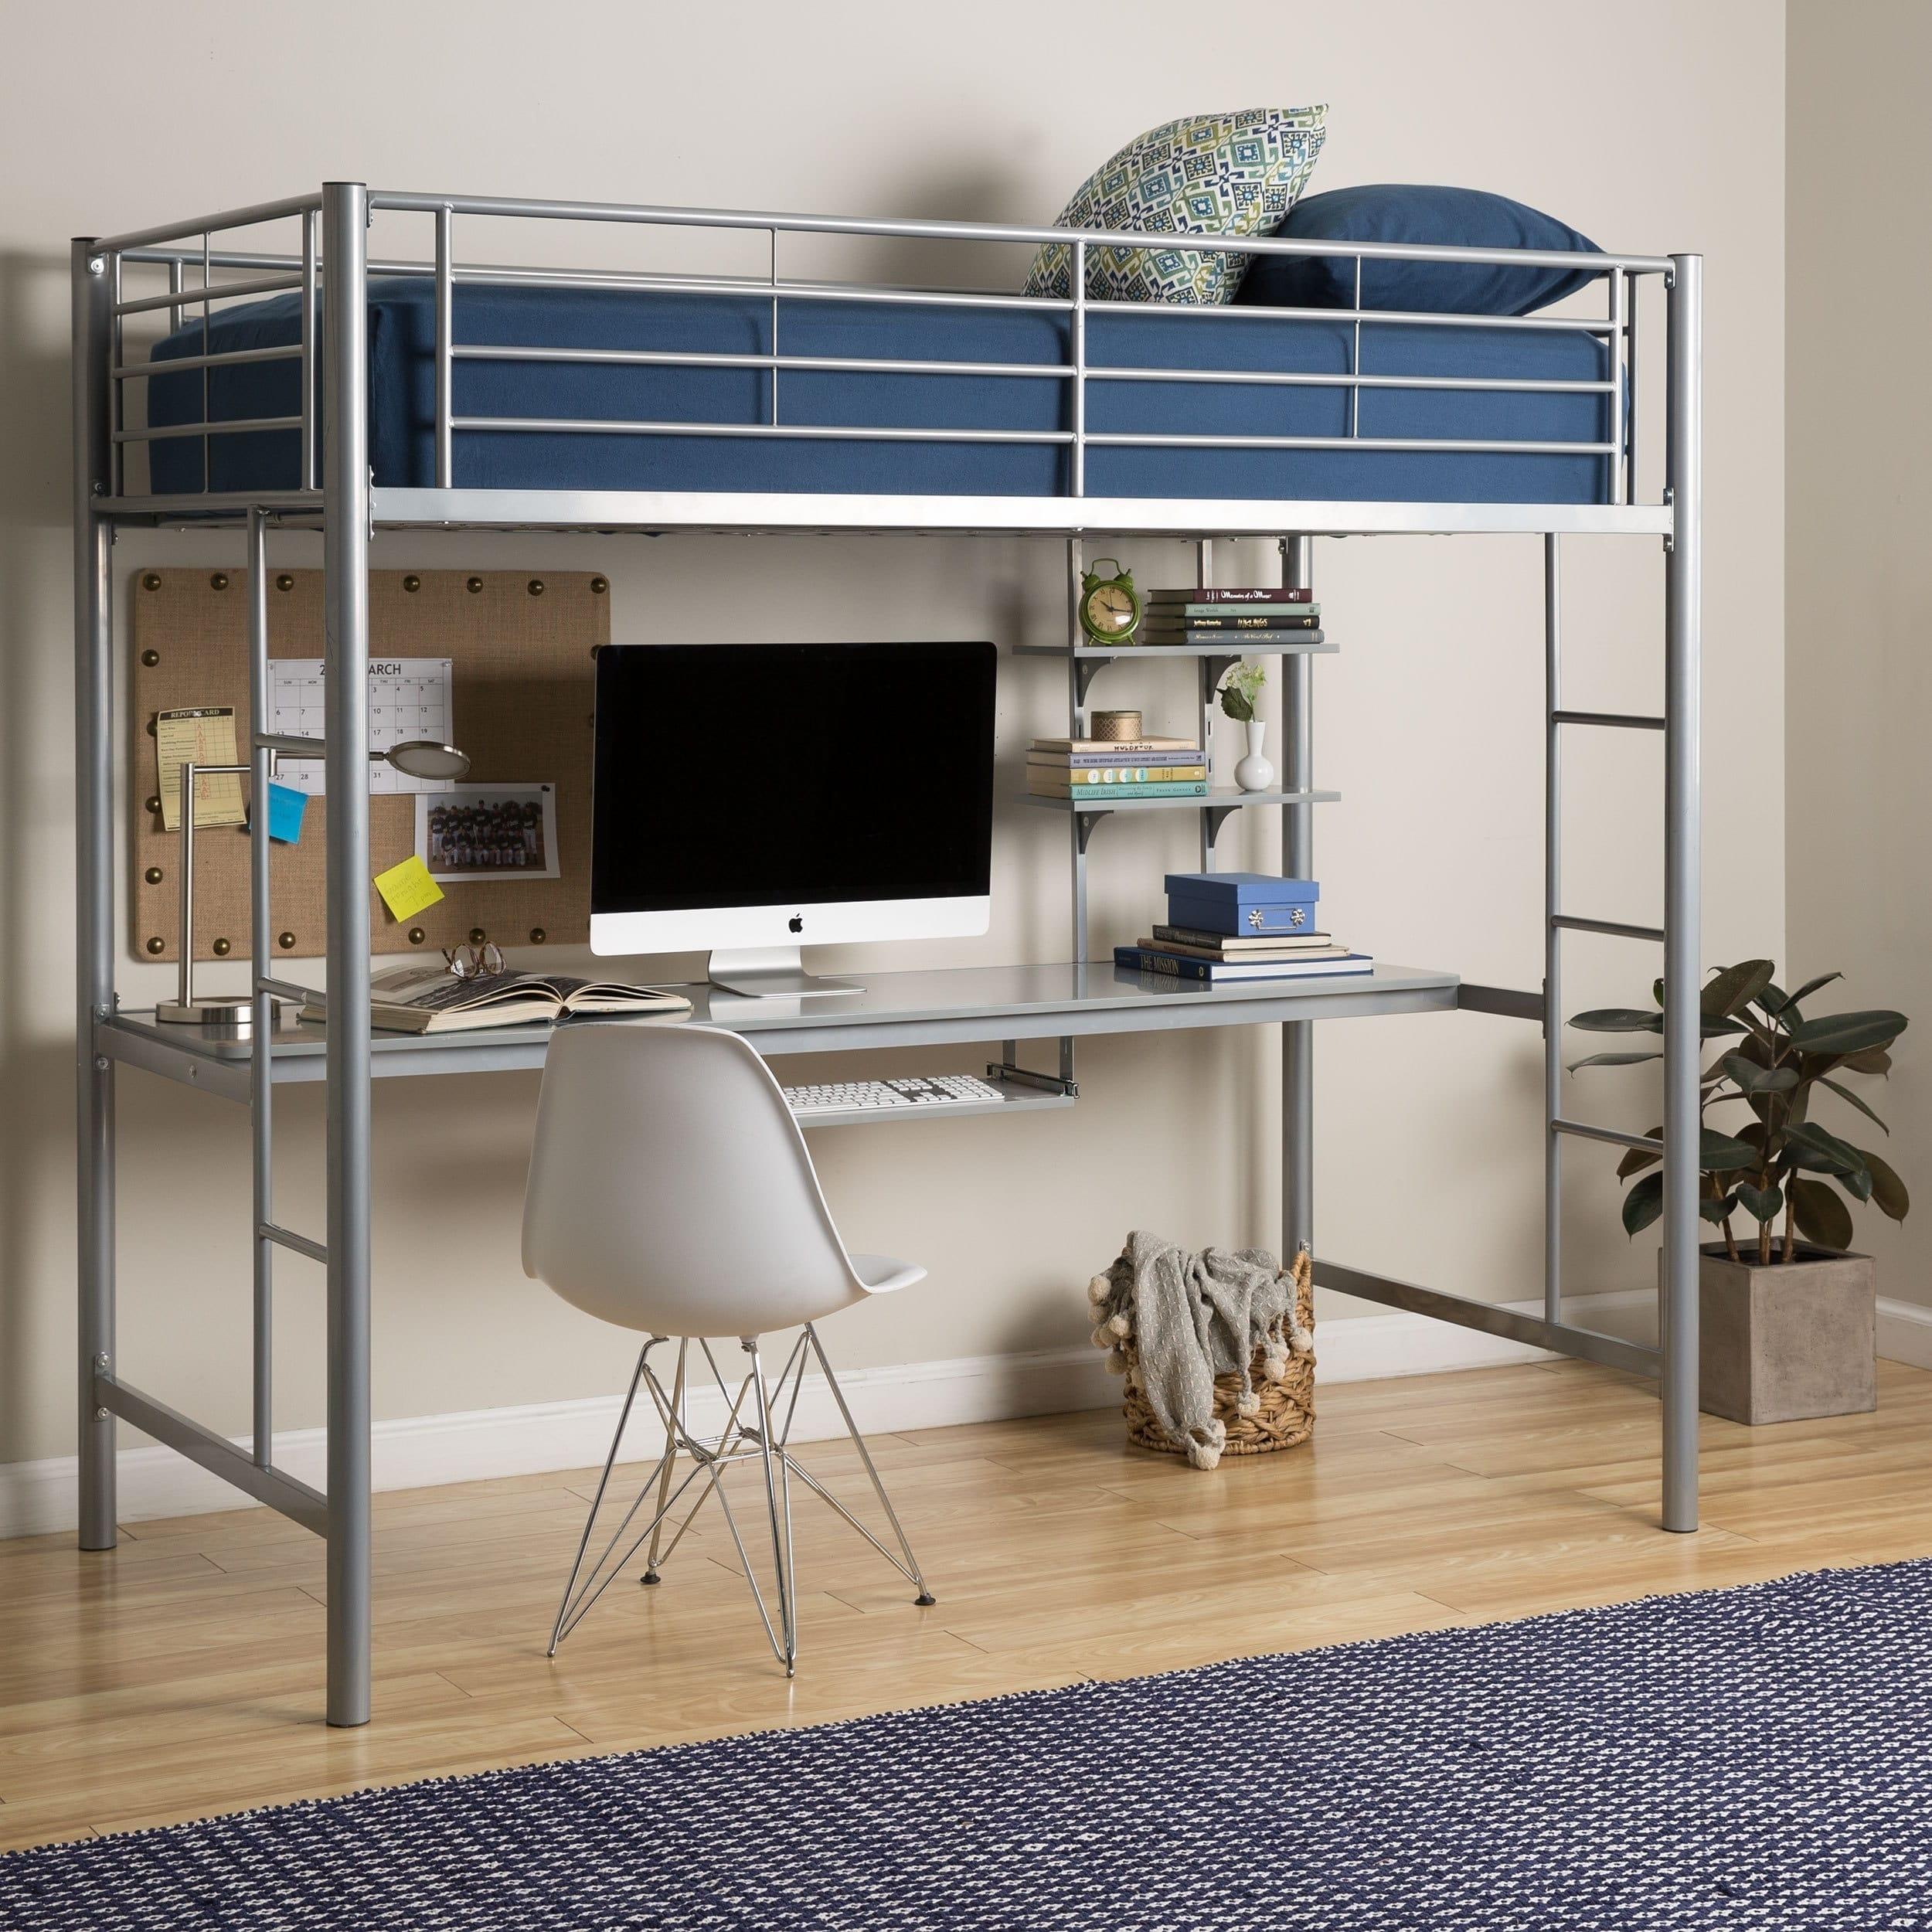 Groovy Taylor Olive Abner Twin Metal Loft Bed With Desk Home Interior And Landscaping Ponolsignezvosmurscom